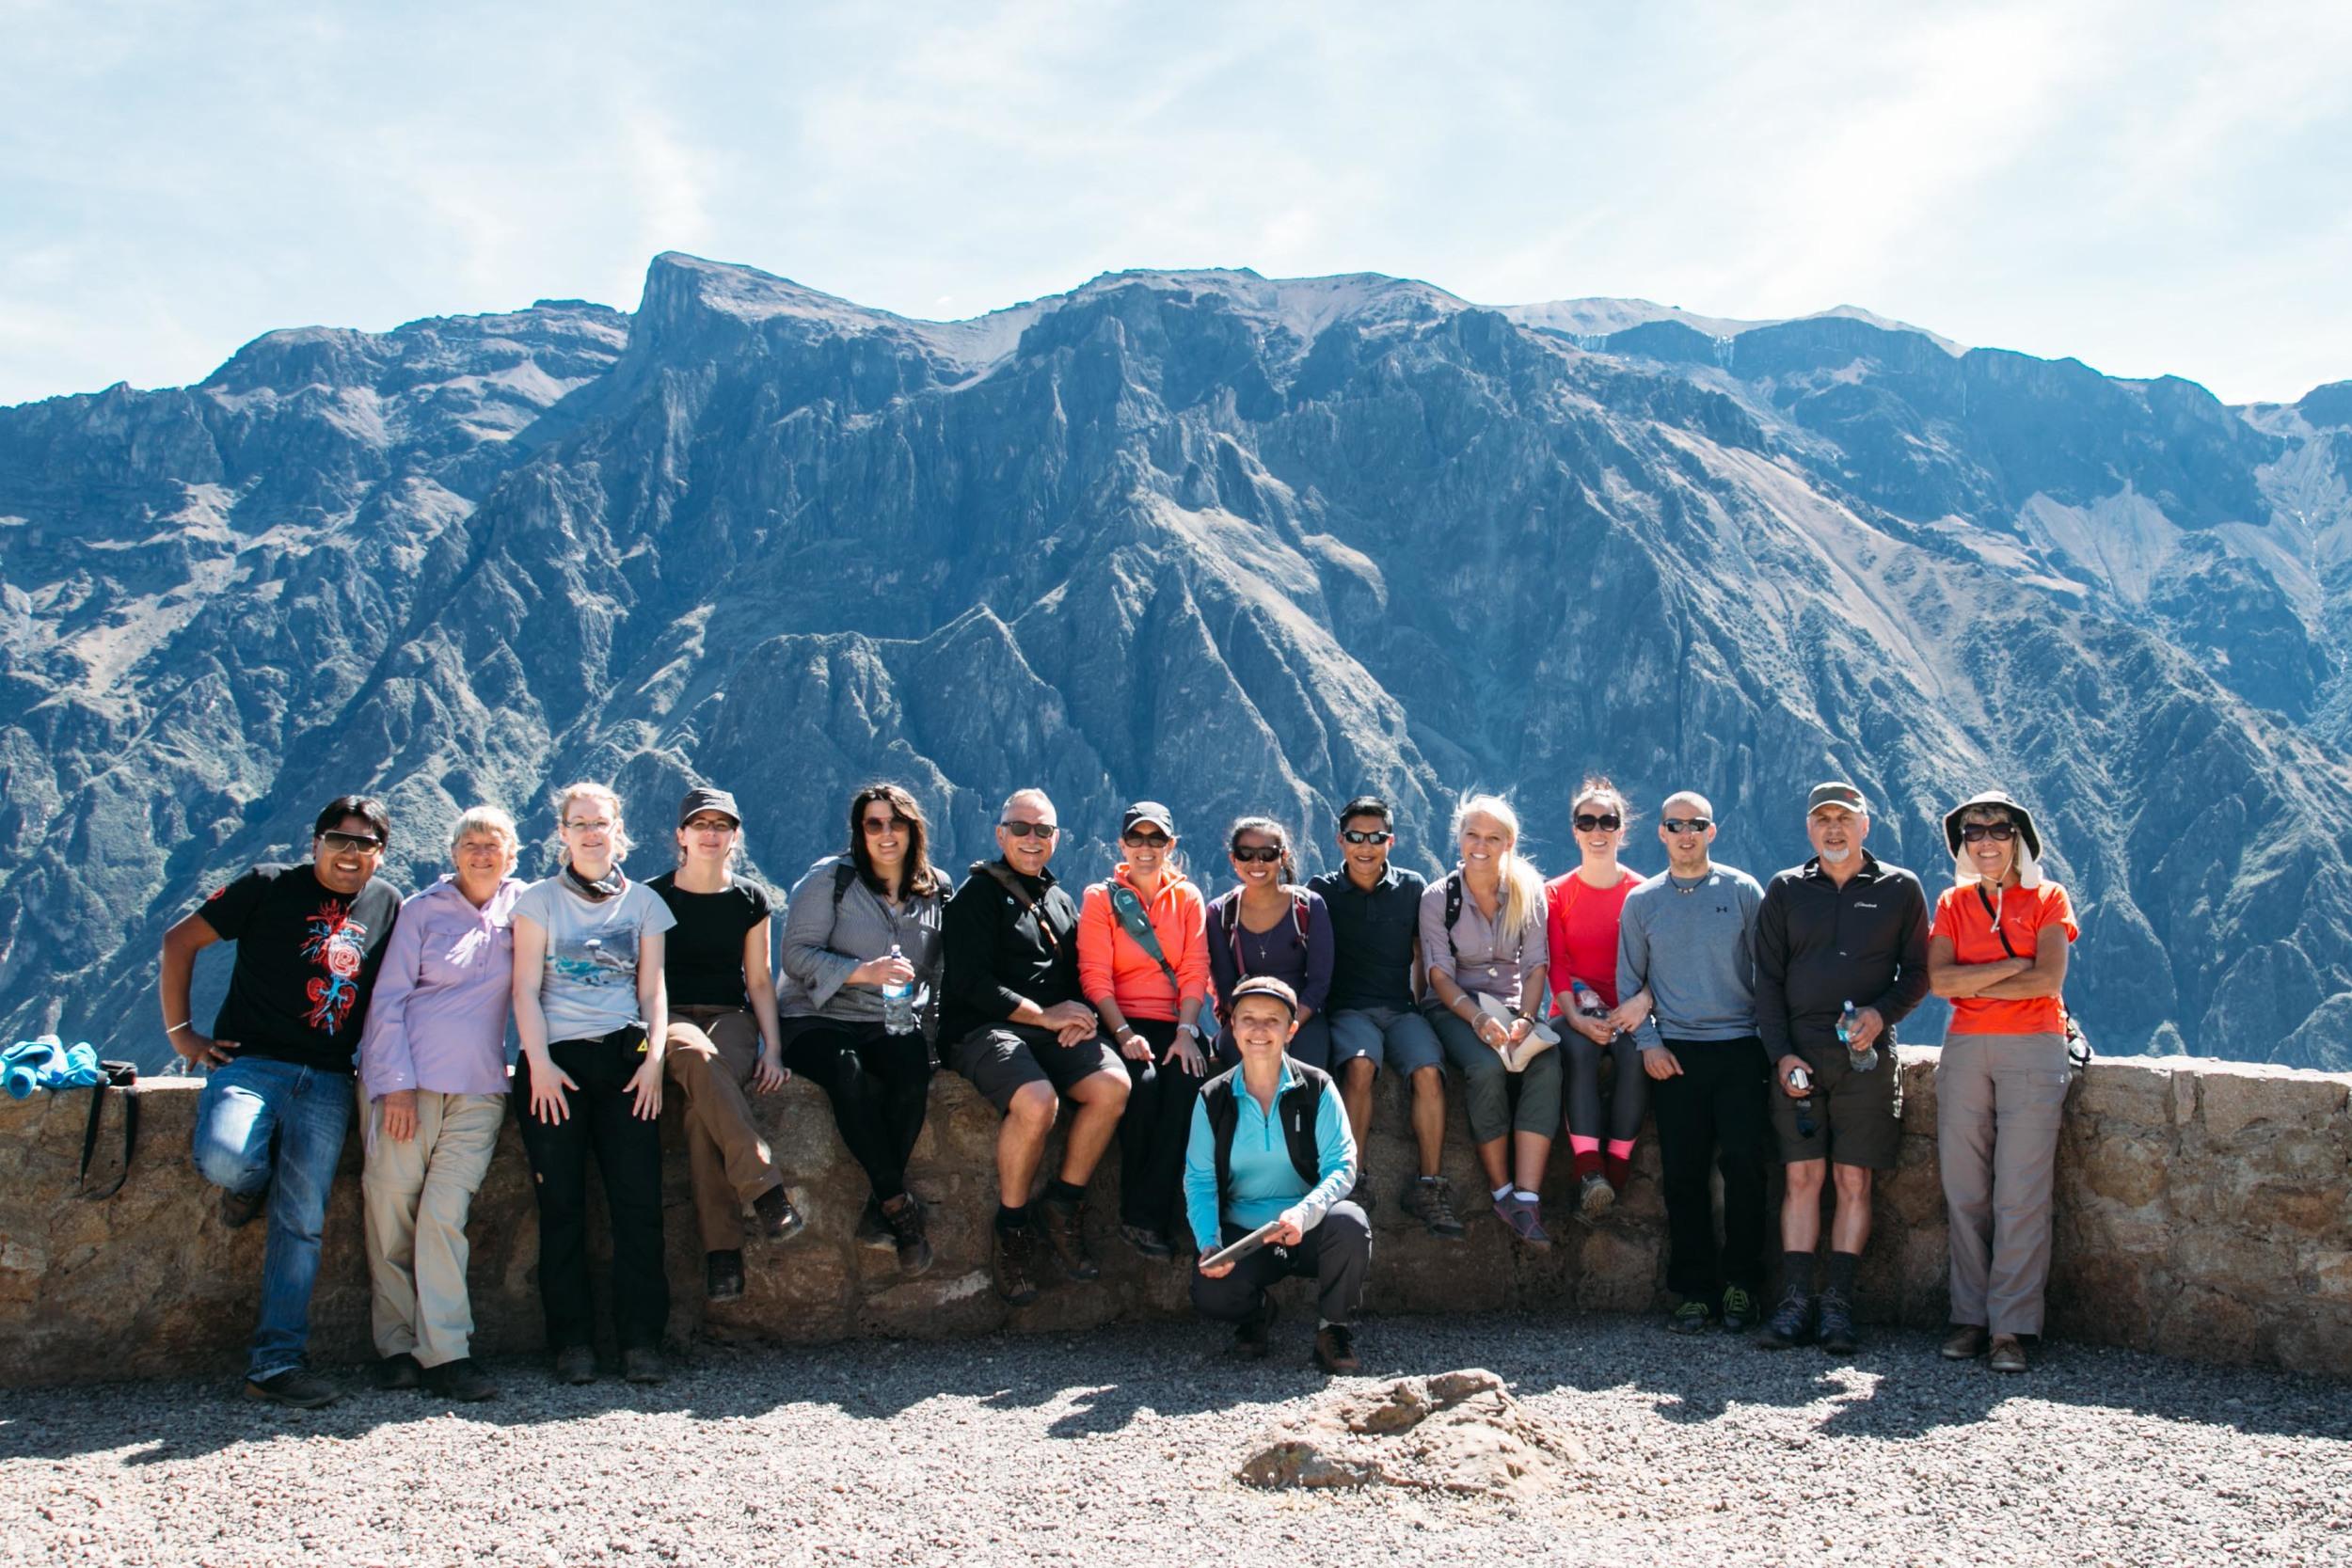 Group shot of Colca Canyon